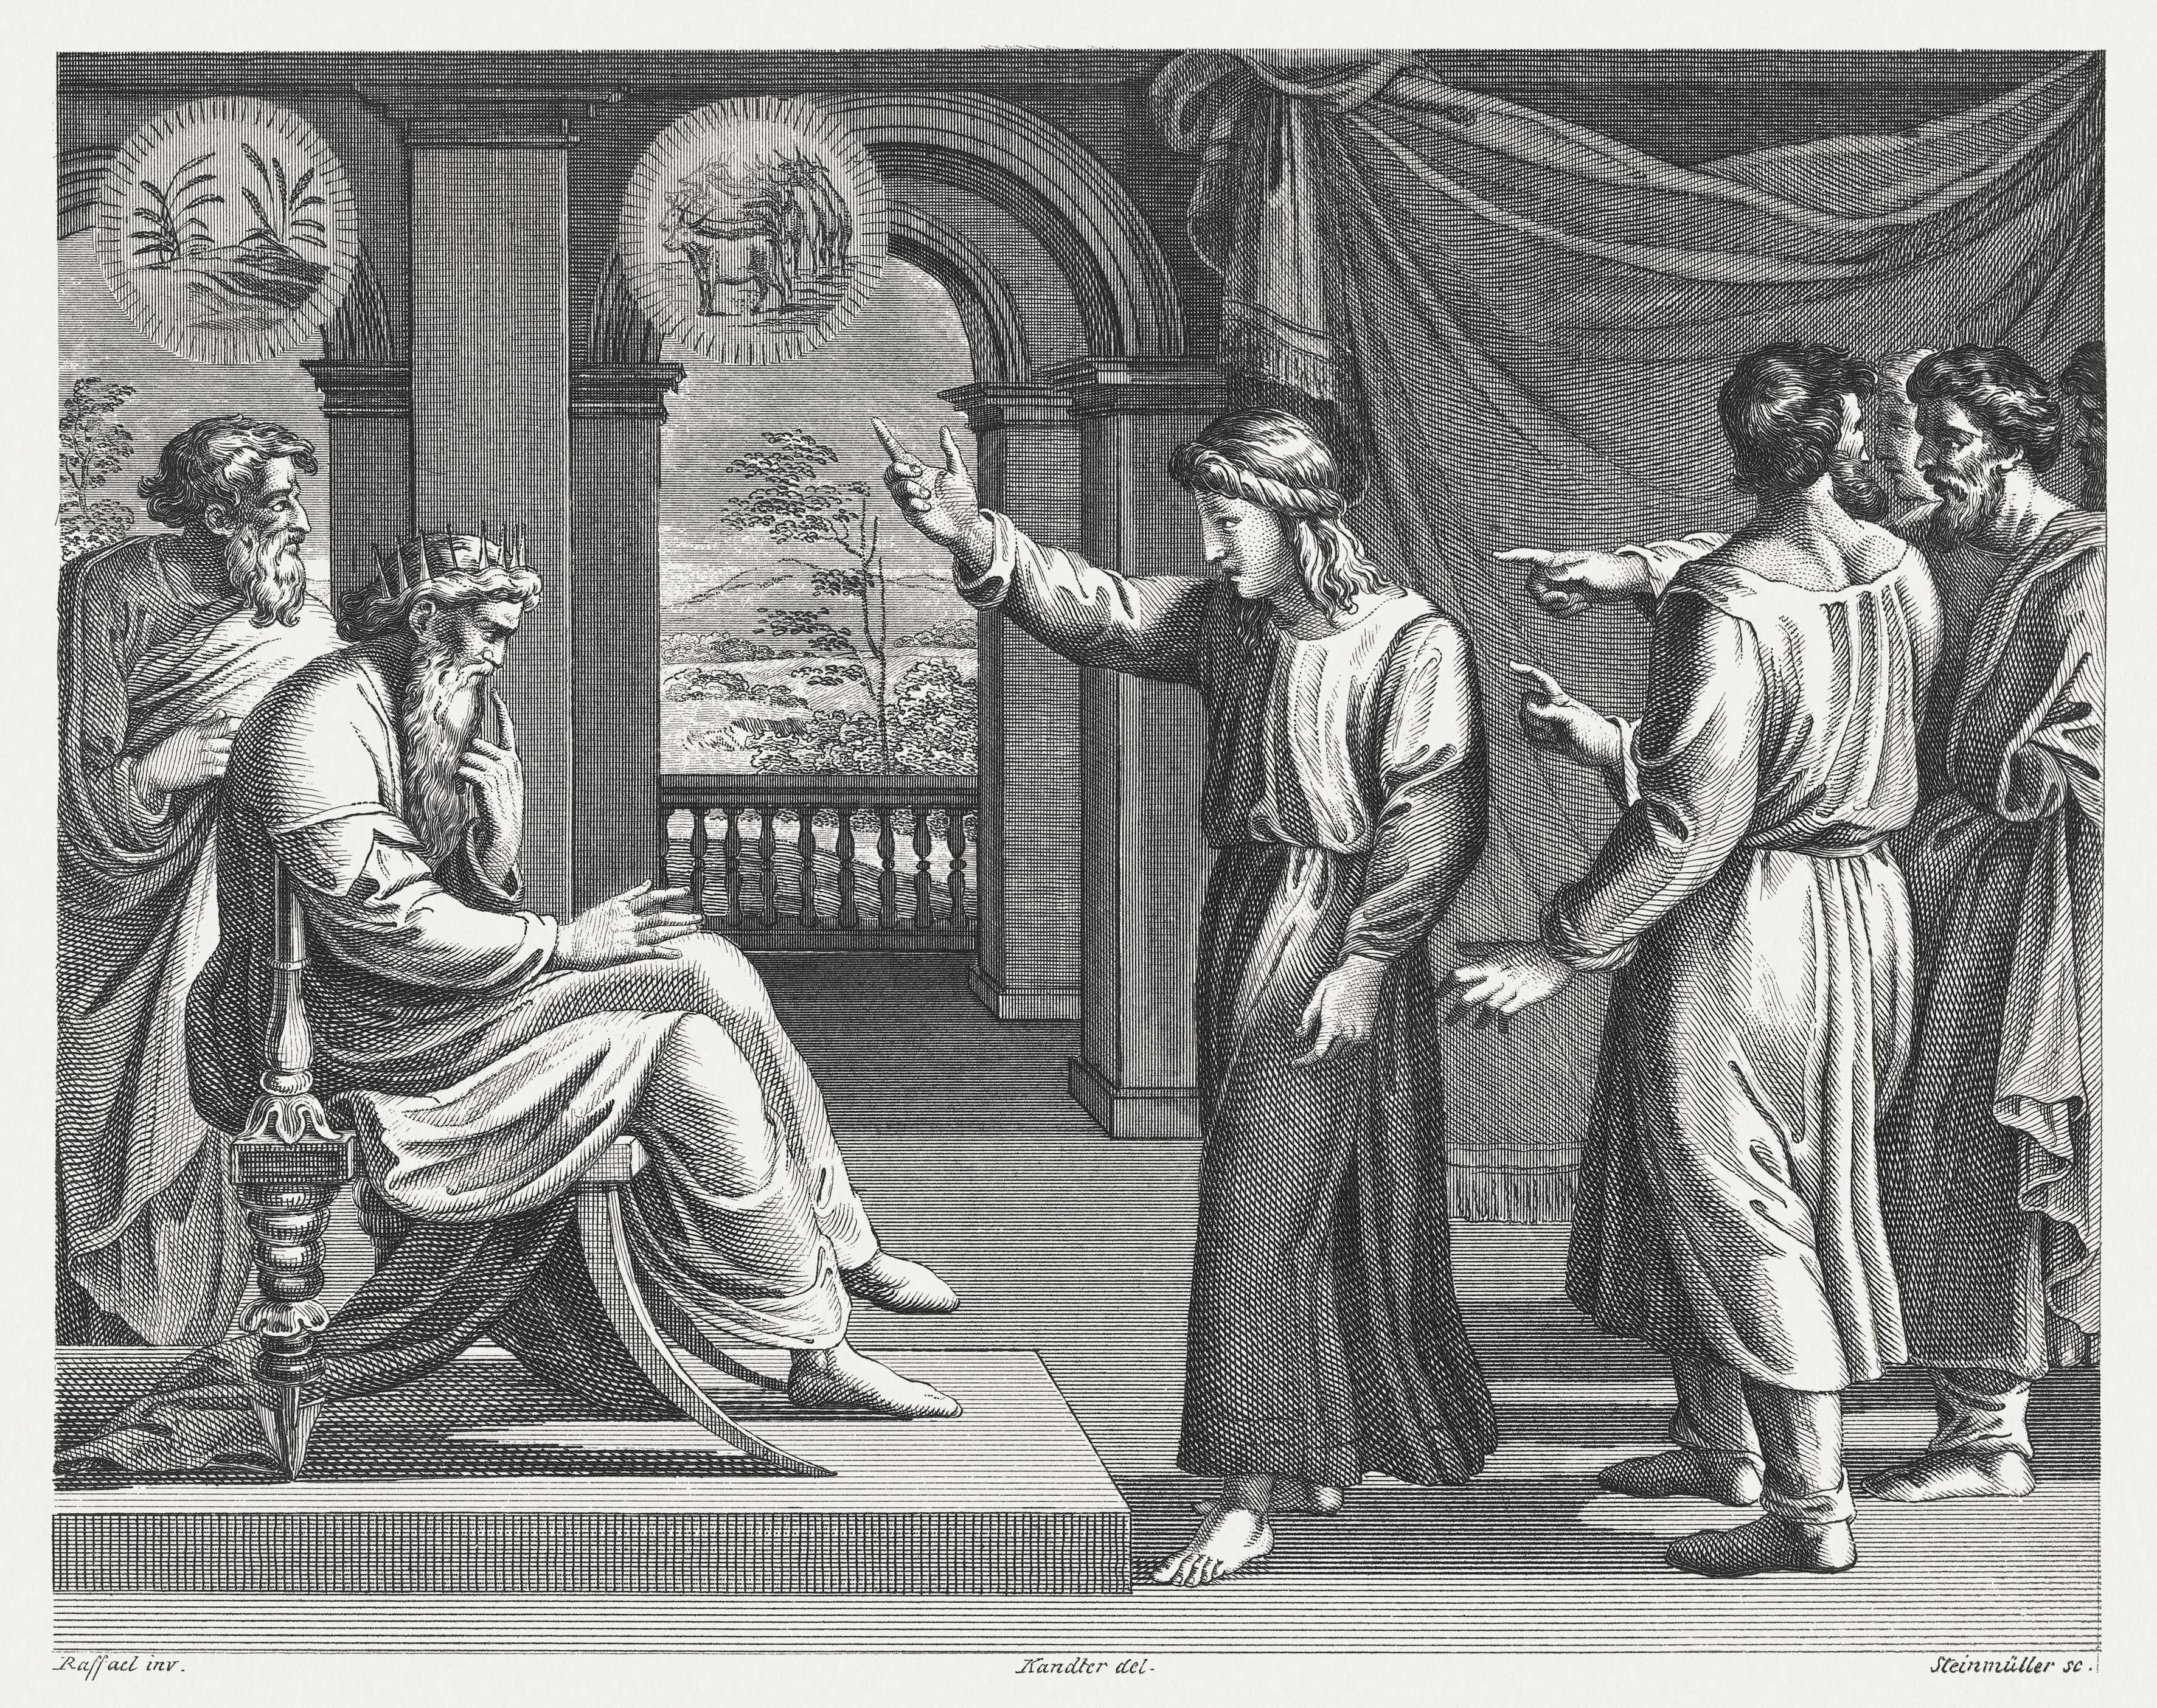 Joseph interprets Pharaoh's dreams (Genesis 41), steel engraving, published 1841